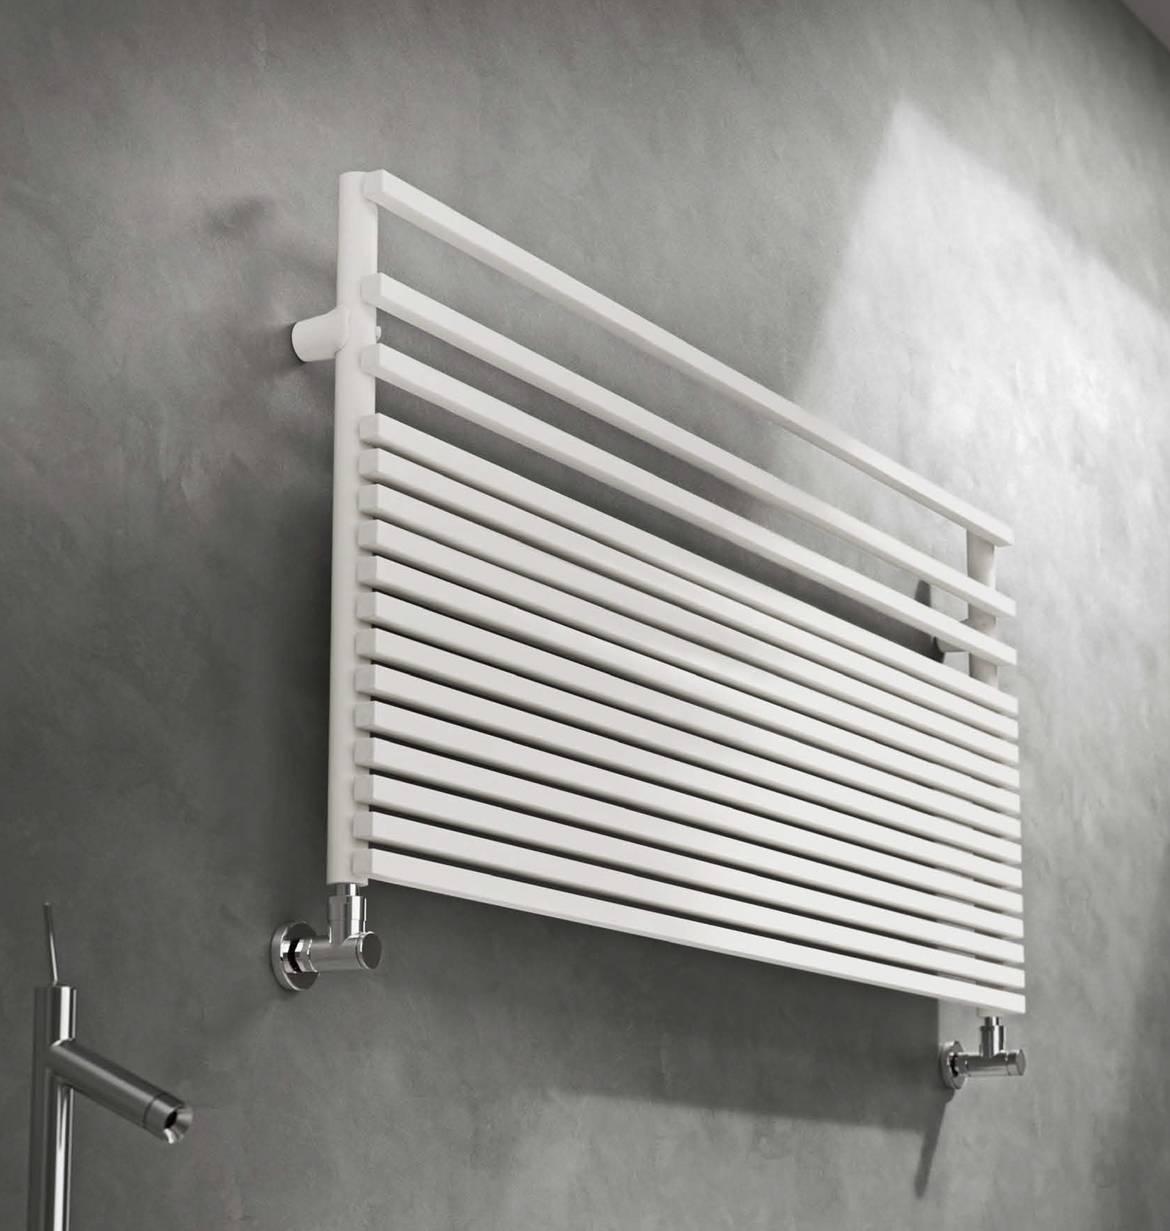 Seche Serviette de bain Graziano-modèle Infinity blanc horizontal